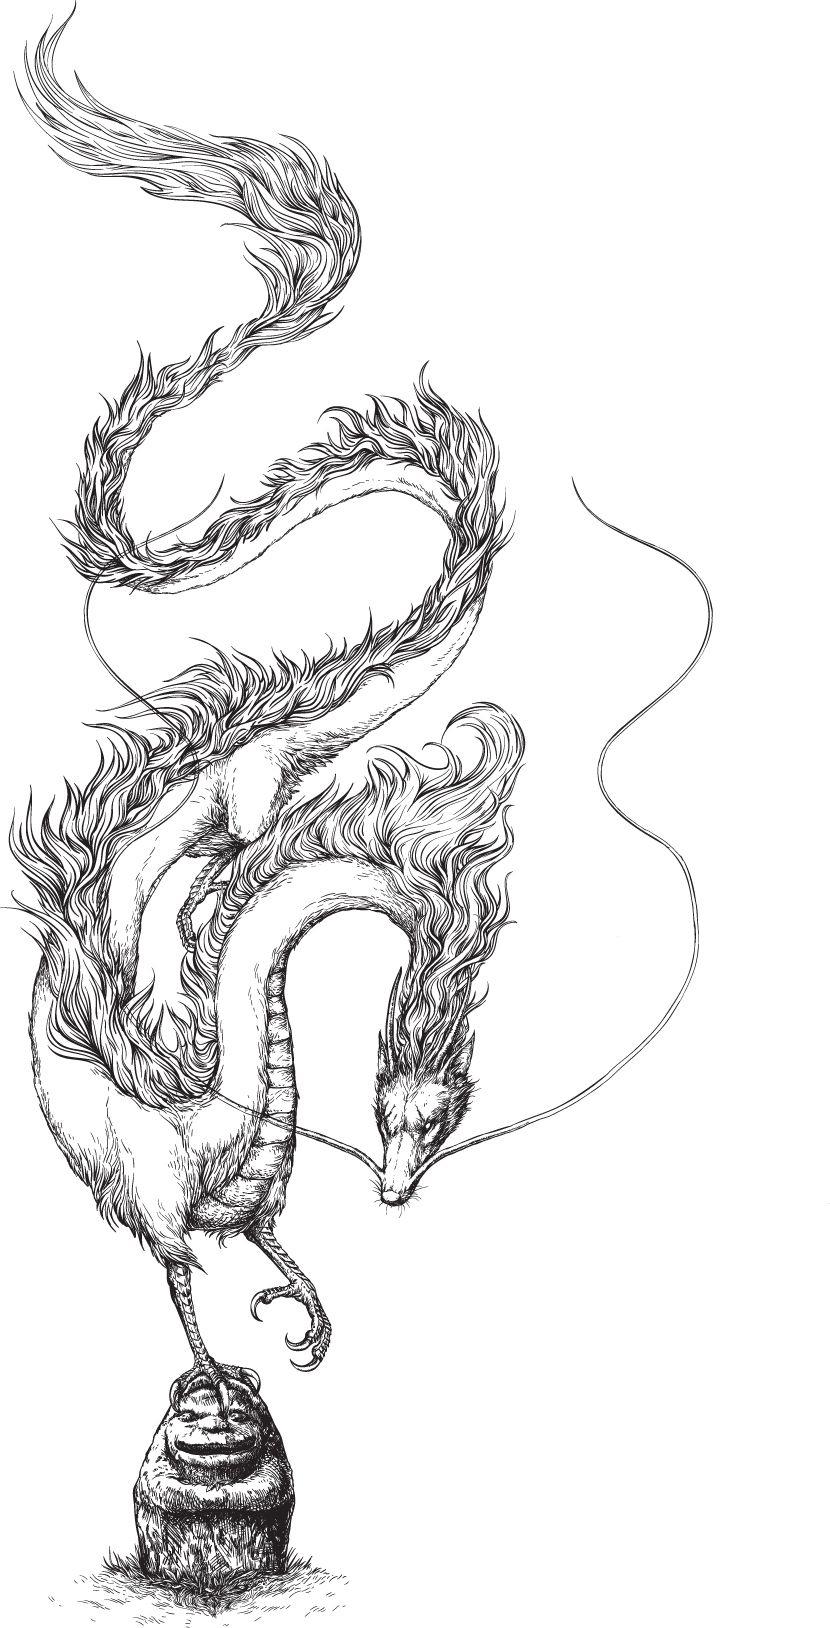 Tribute To Ghibli Spirited Away On Behance If I Ever Got A Dragon Tattoo It D Be Haku Studio Ghibli Tattoo Ghibli Tattoo Dragon Tattoo Foot